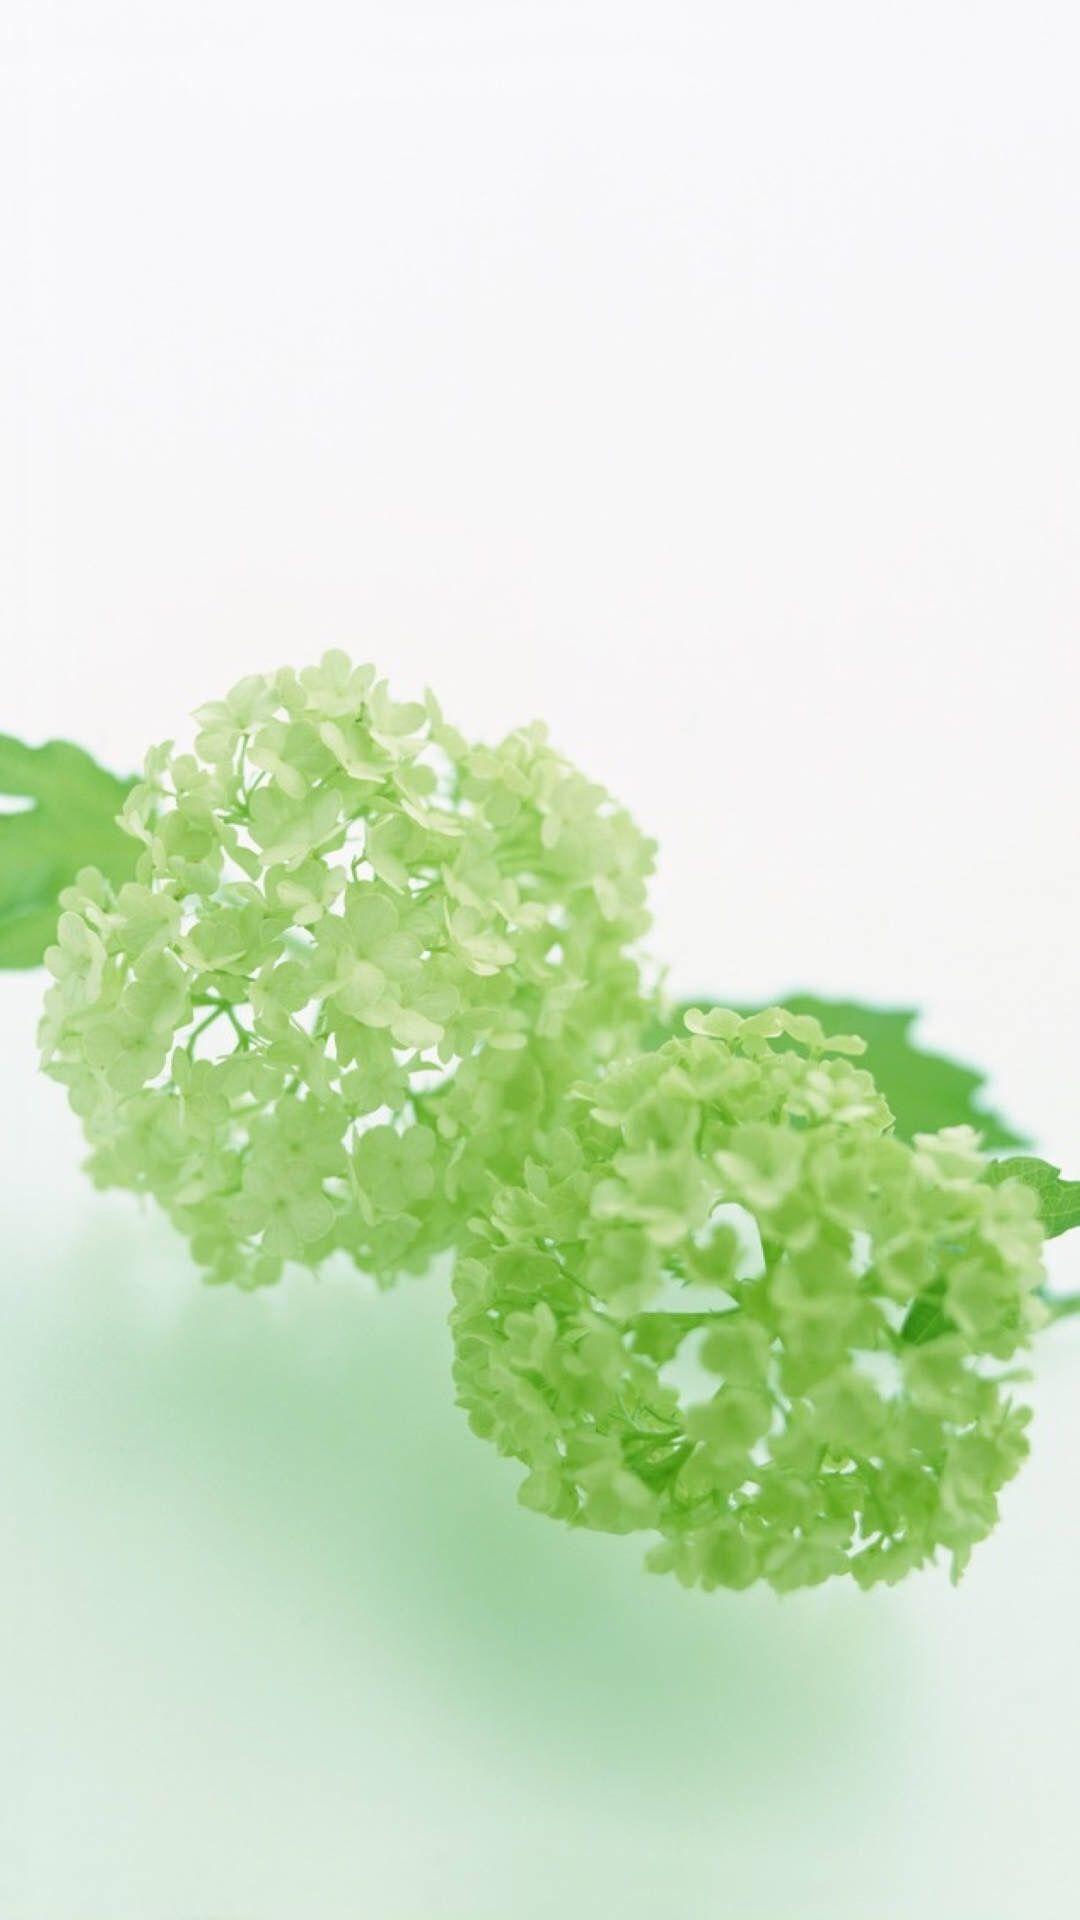 Hydrangea Flowers Are Greenish